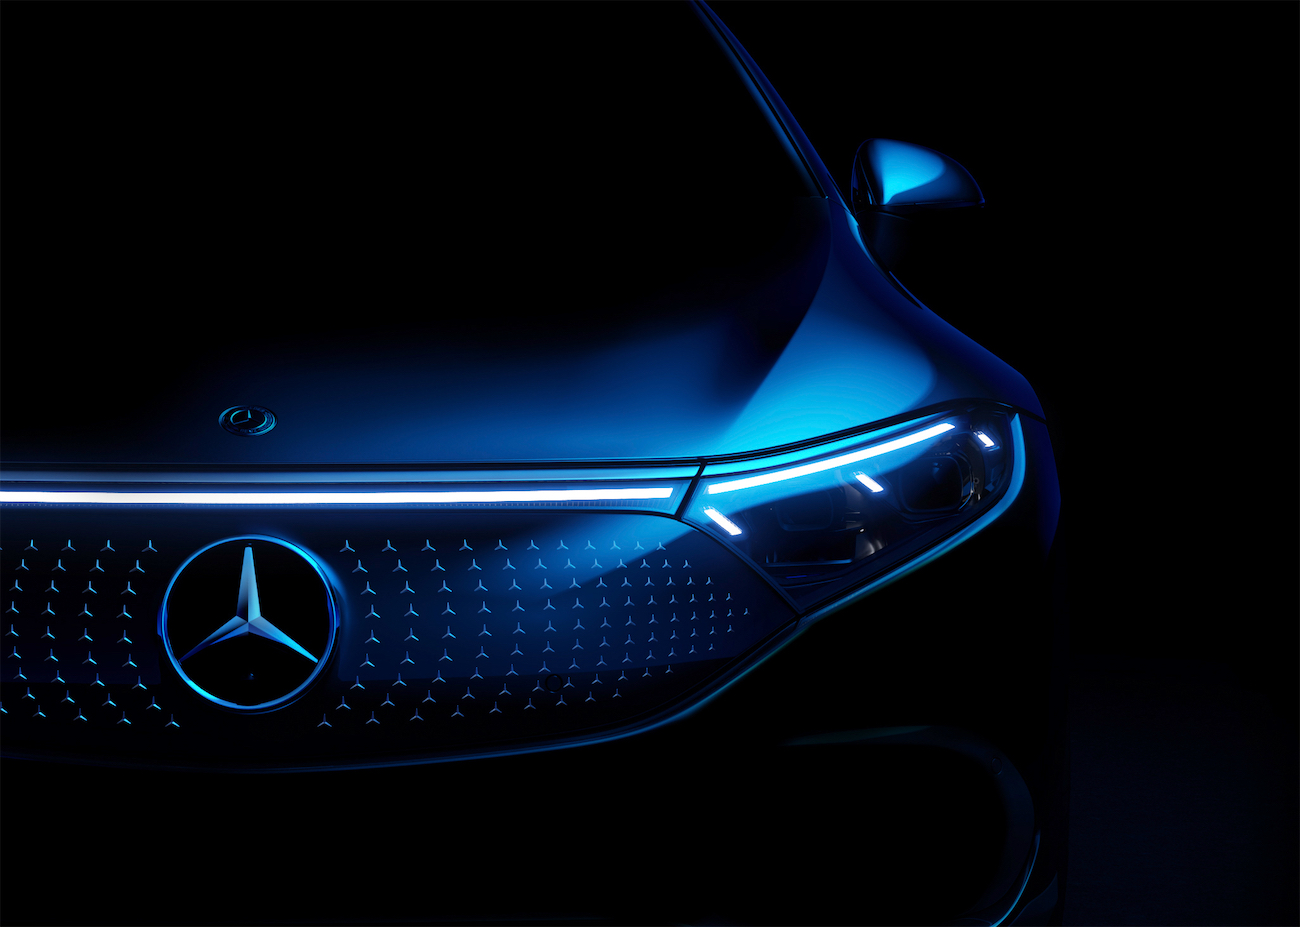 2021 Mercedes-Benz EQS leManoosh industrial design blog and online courses